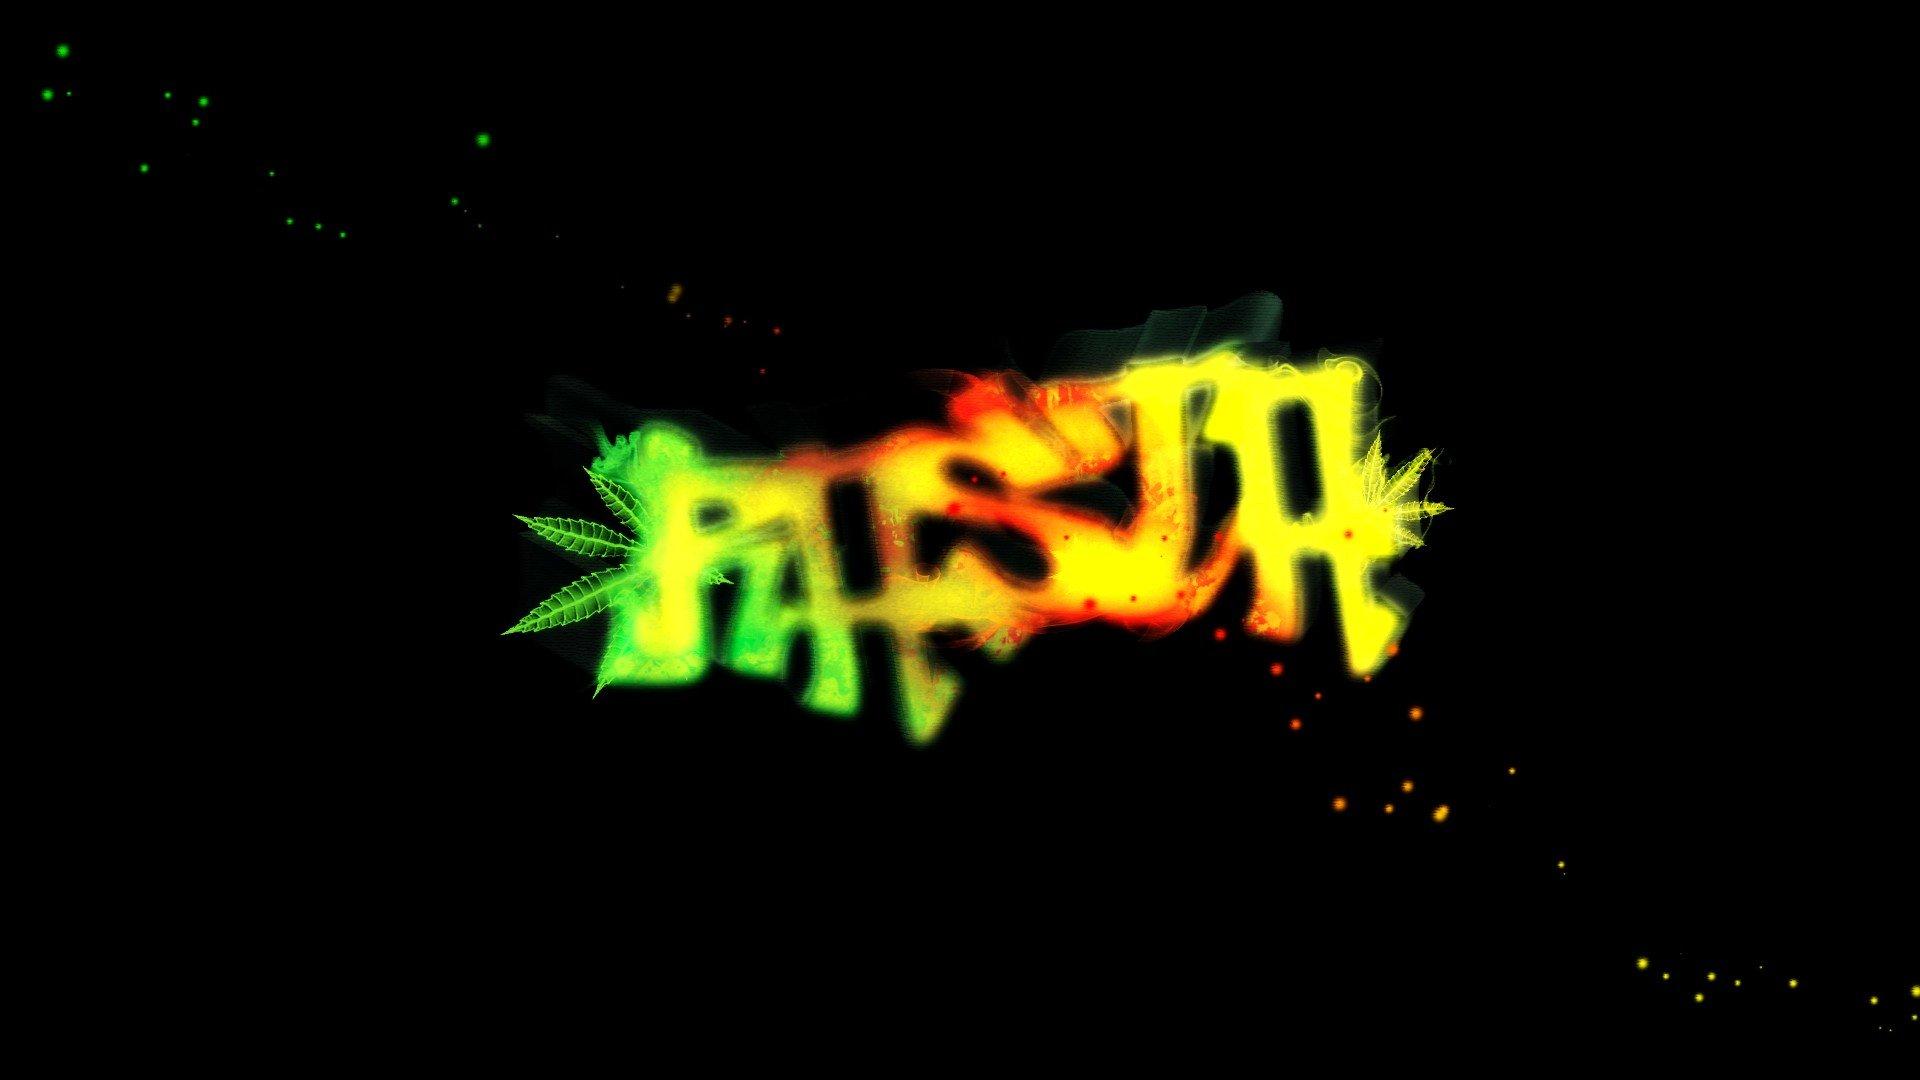 Leaves Smoke Graffiti Sparkles Marijuana Typography Glowing Rasta Glow Television Rastafari Wallpaper